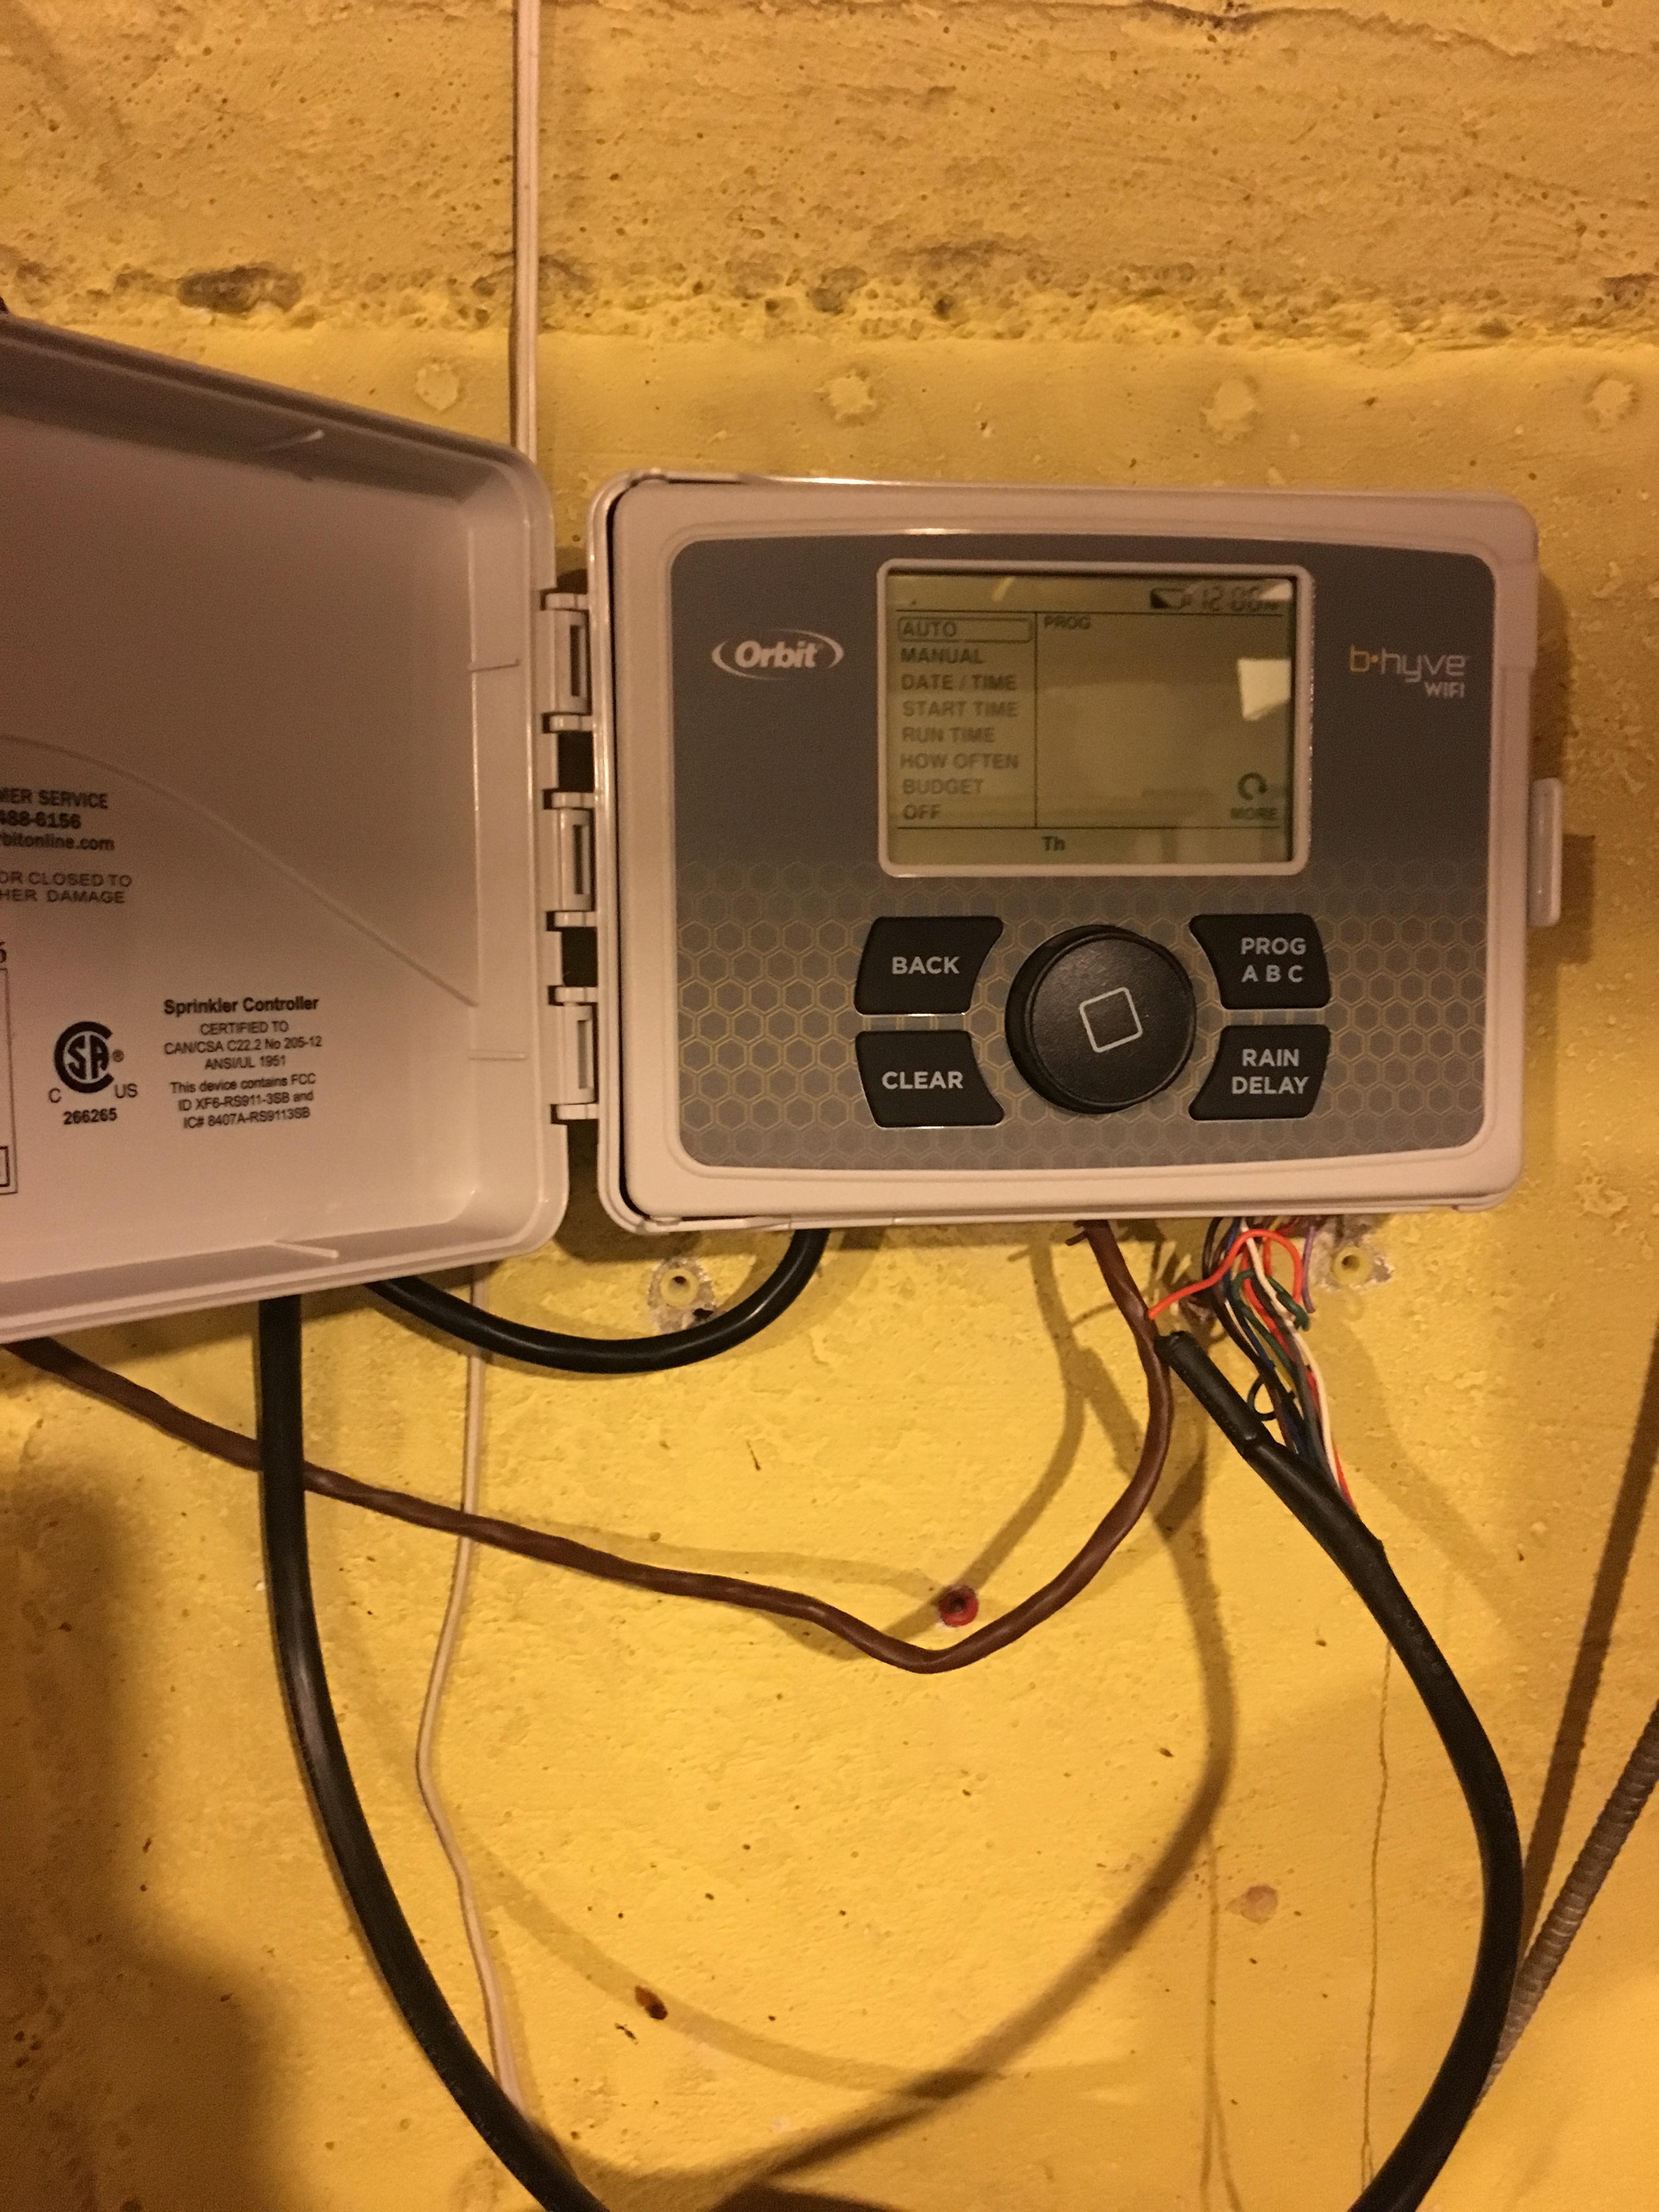 Orbit 57950 B-hyve Smart Indoor//Outdoor 12-Station WiFi Sprinkler System Control